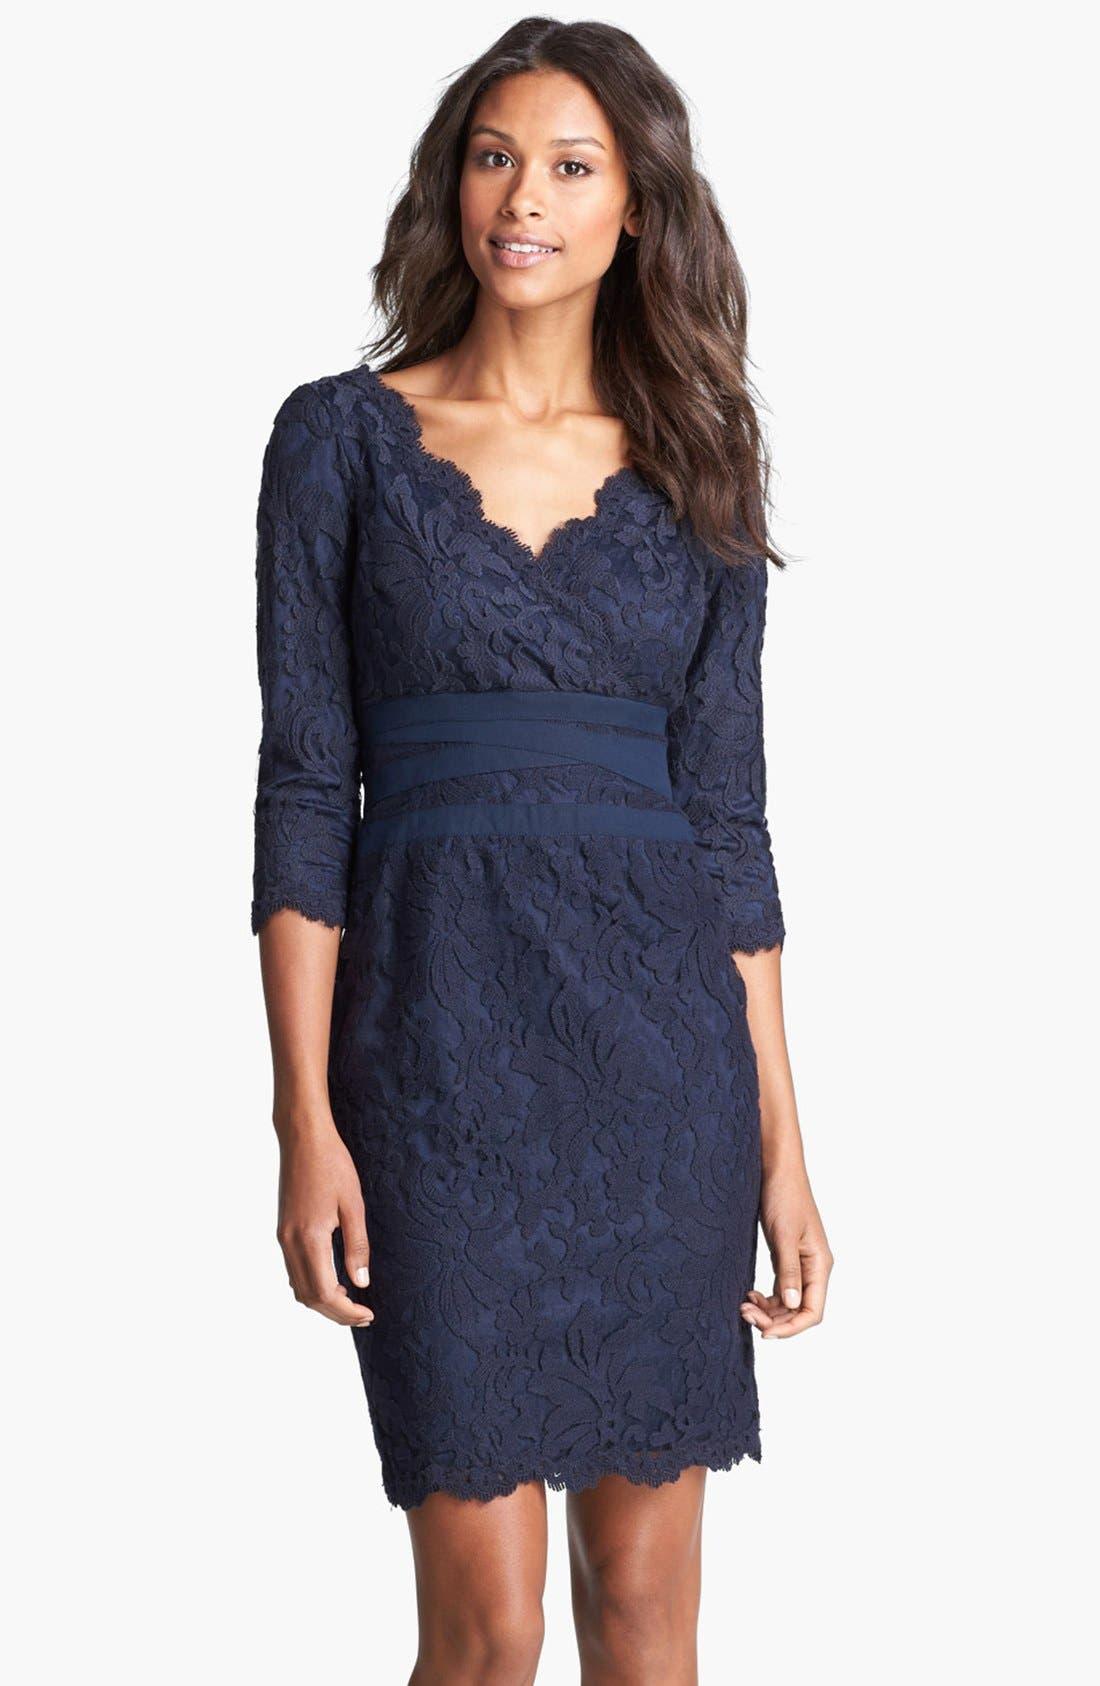 Alternate Image 1 Selected - Tadashi Shoji Lace Sheath Dress (Regular & Petite)